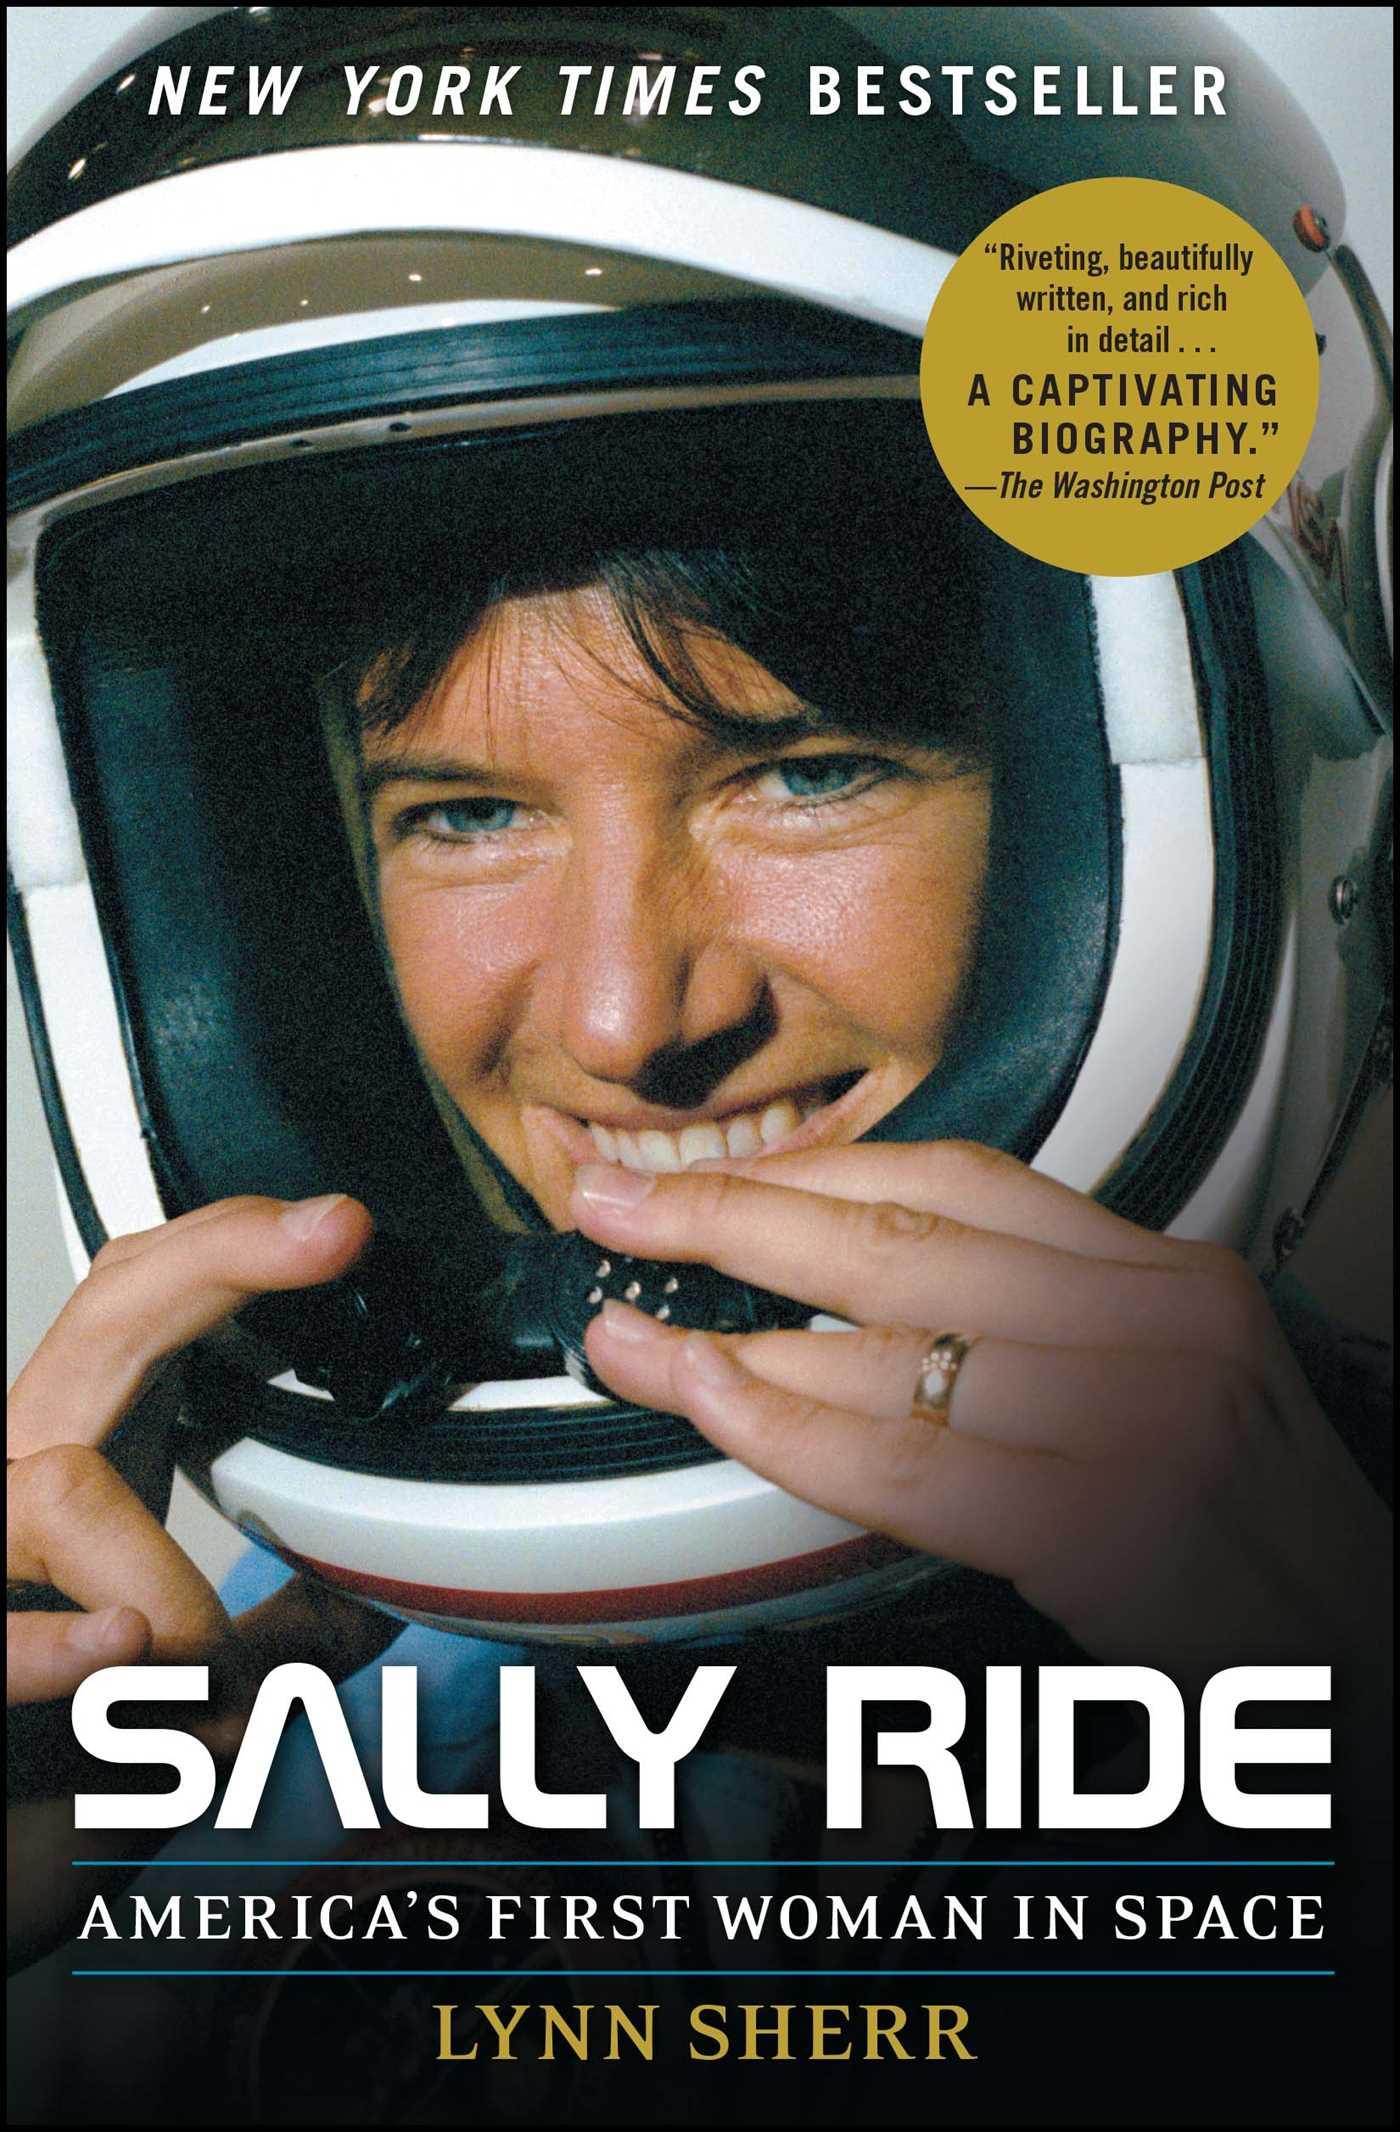 Sally ride 9781476725772 hr